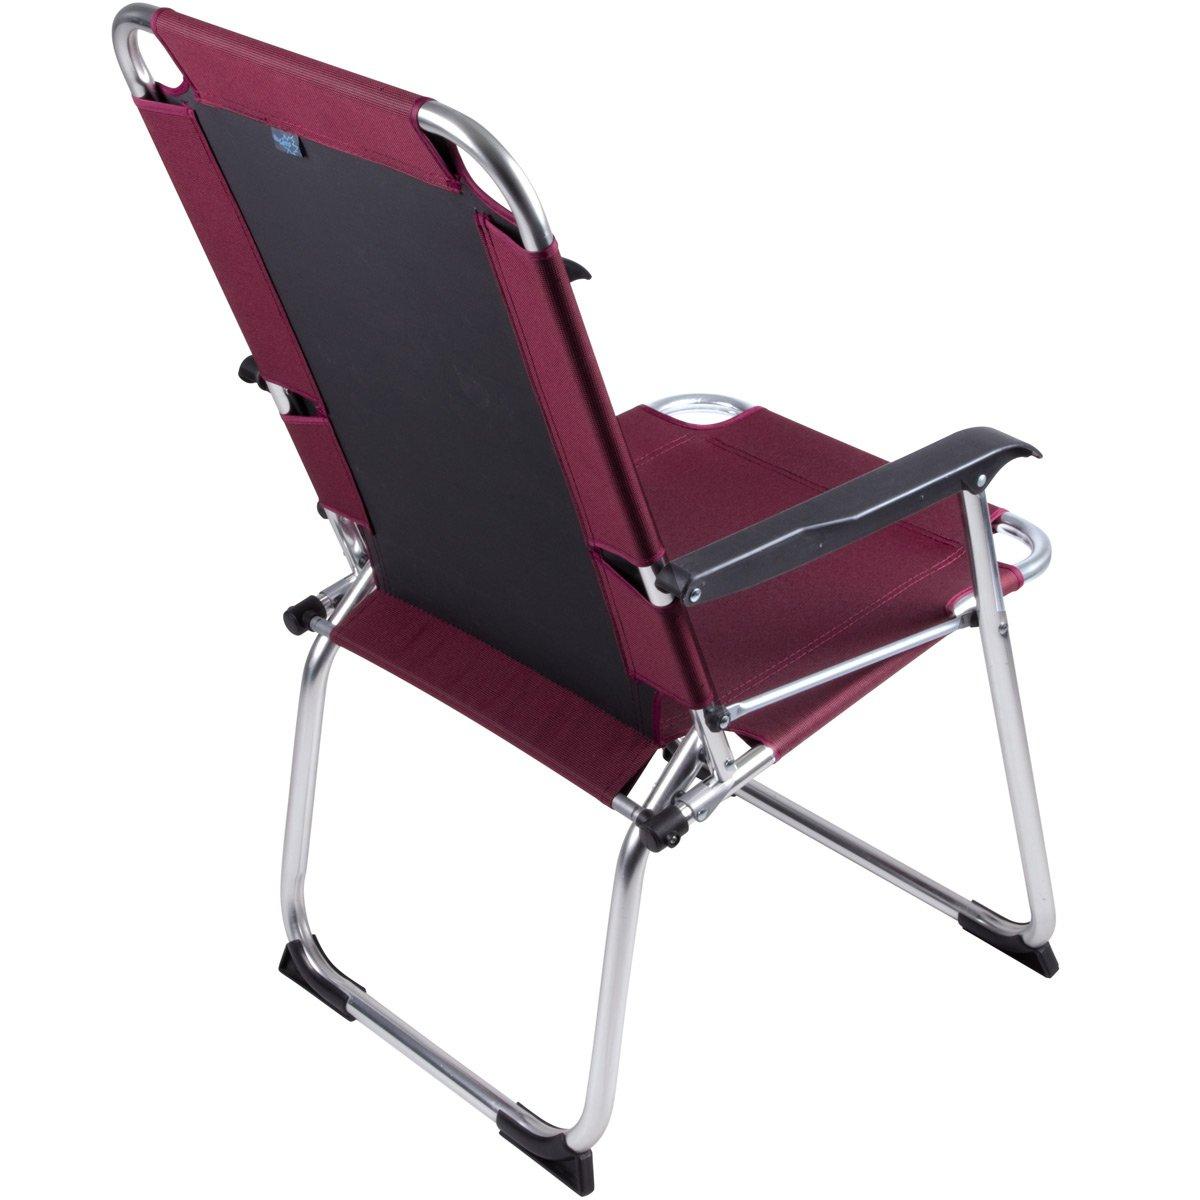 Siehe Beschreibung Camping Klapp-Stuhl Copa Rio Alu Rubin 600D-Gewebe Camping Stuhl Aluminium Klappstuhl Campingzubeh/ör Faltstuhl bis 100kg